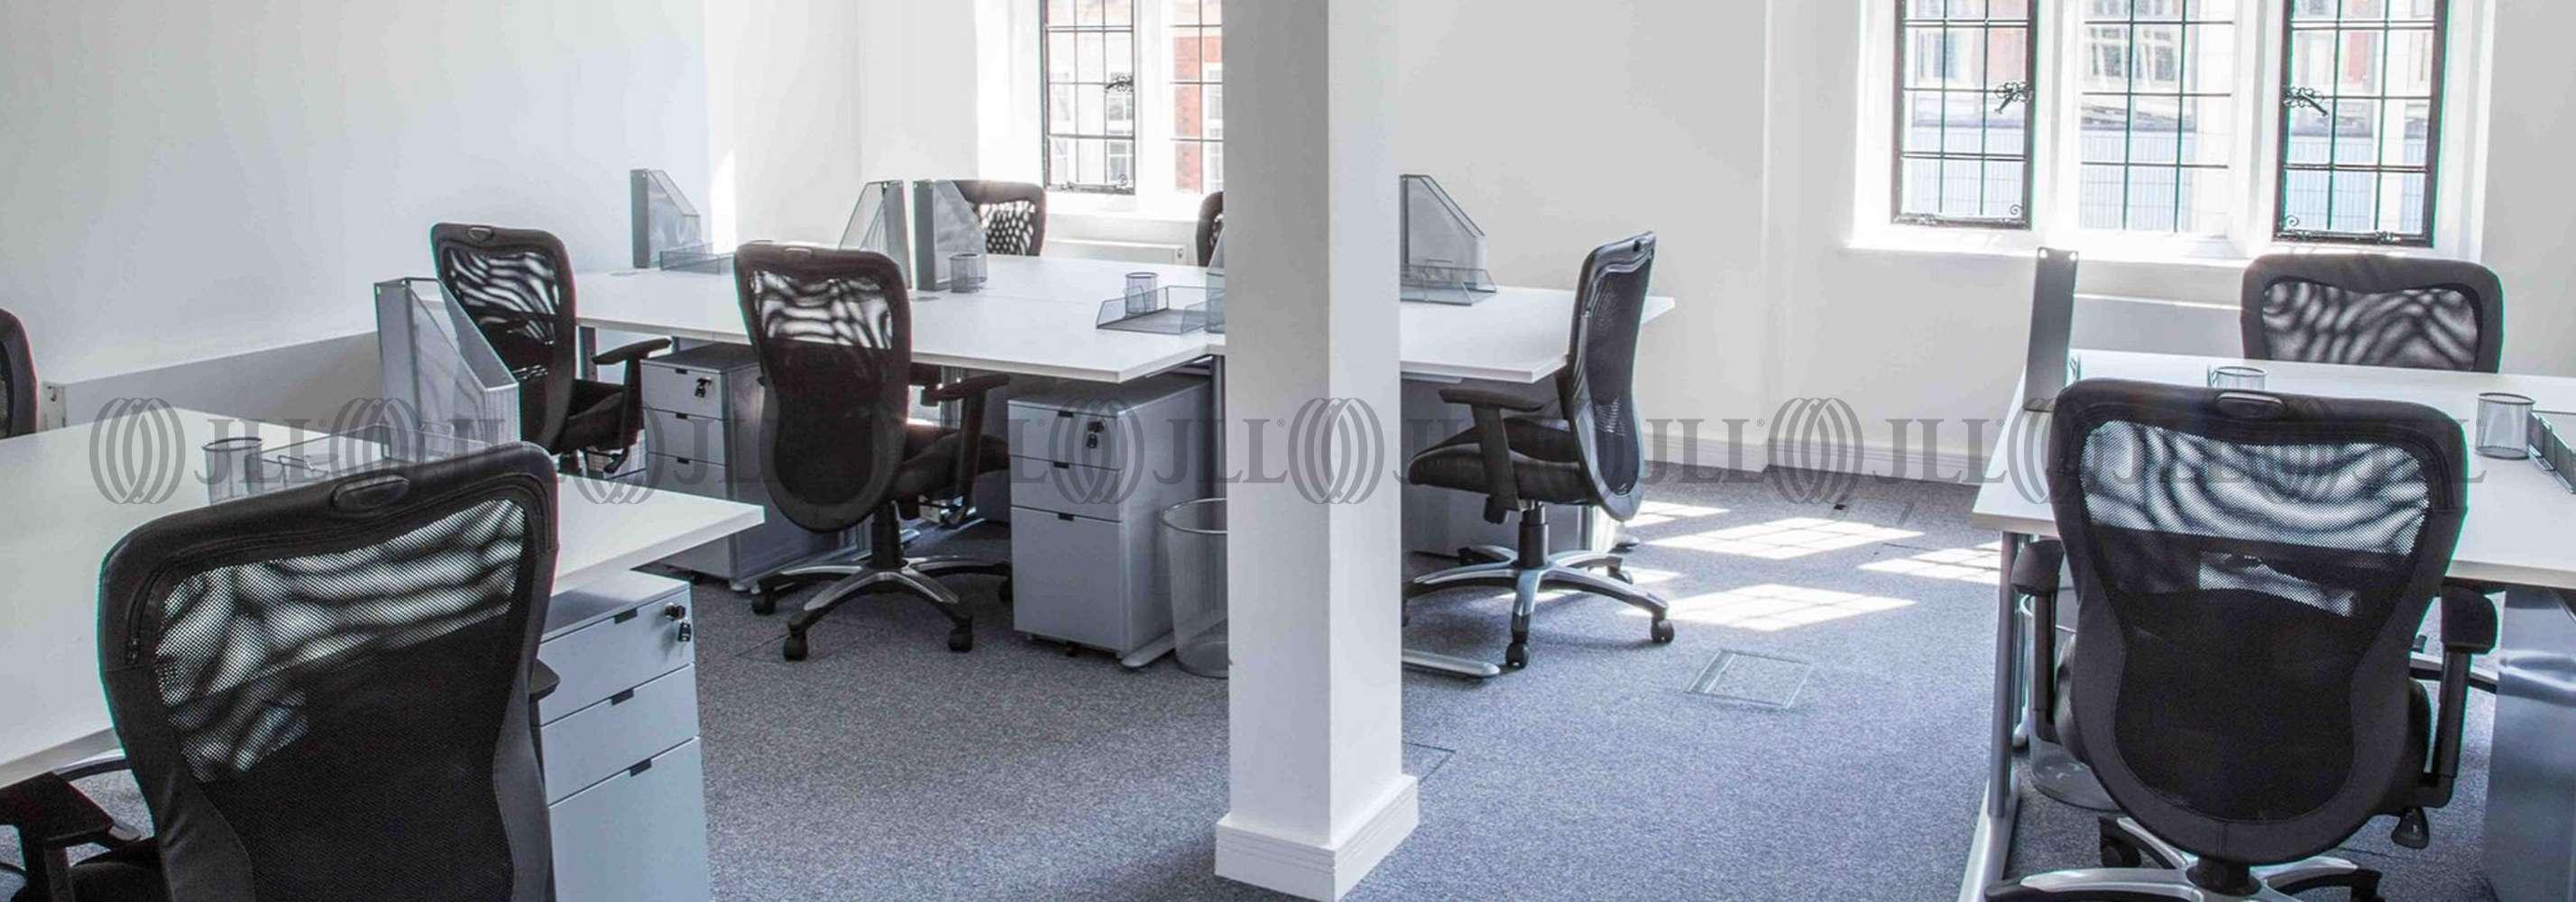 Serviced office London, W1W 8RH - Audley House